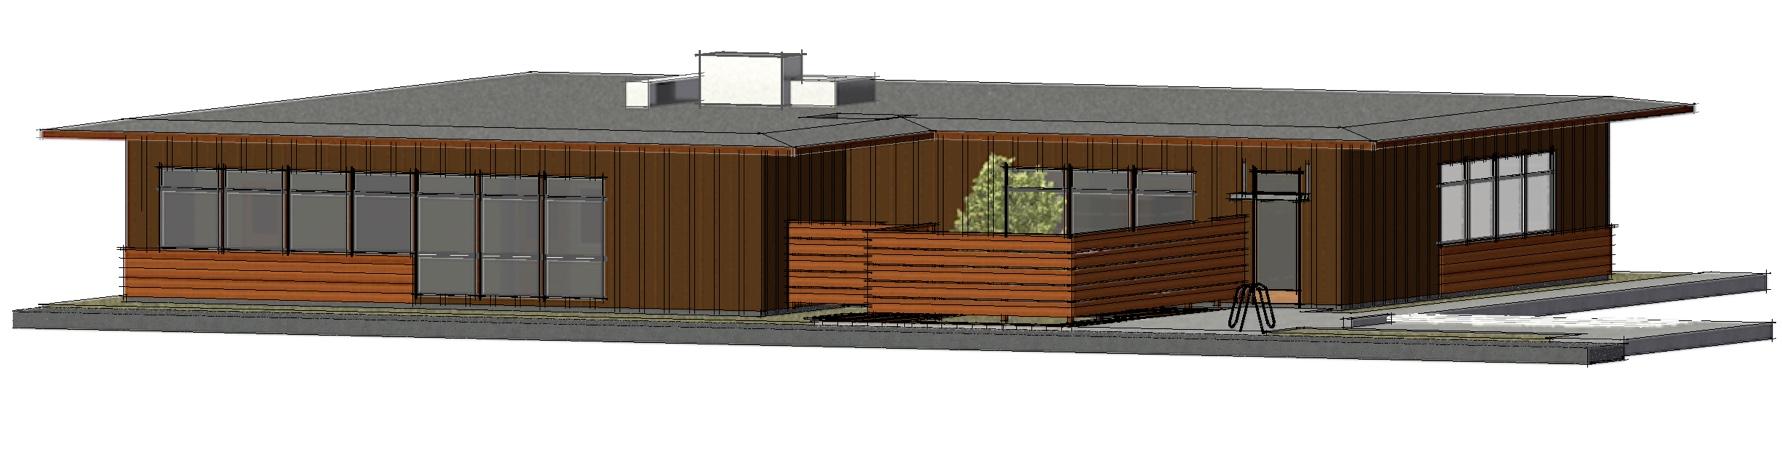 KBoodjeh_Architects_Arcata_Dentist.jpg